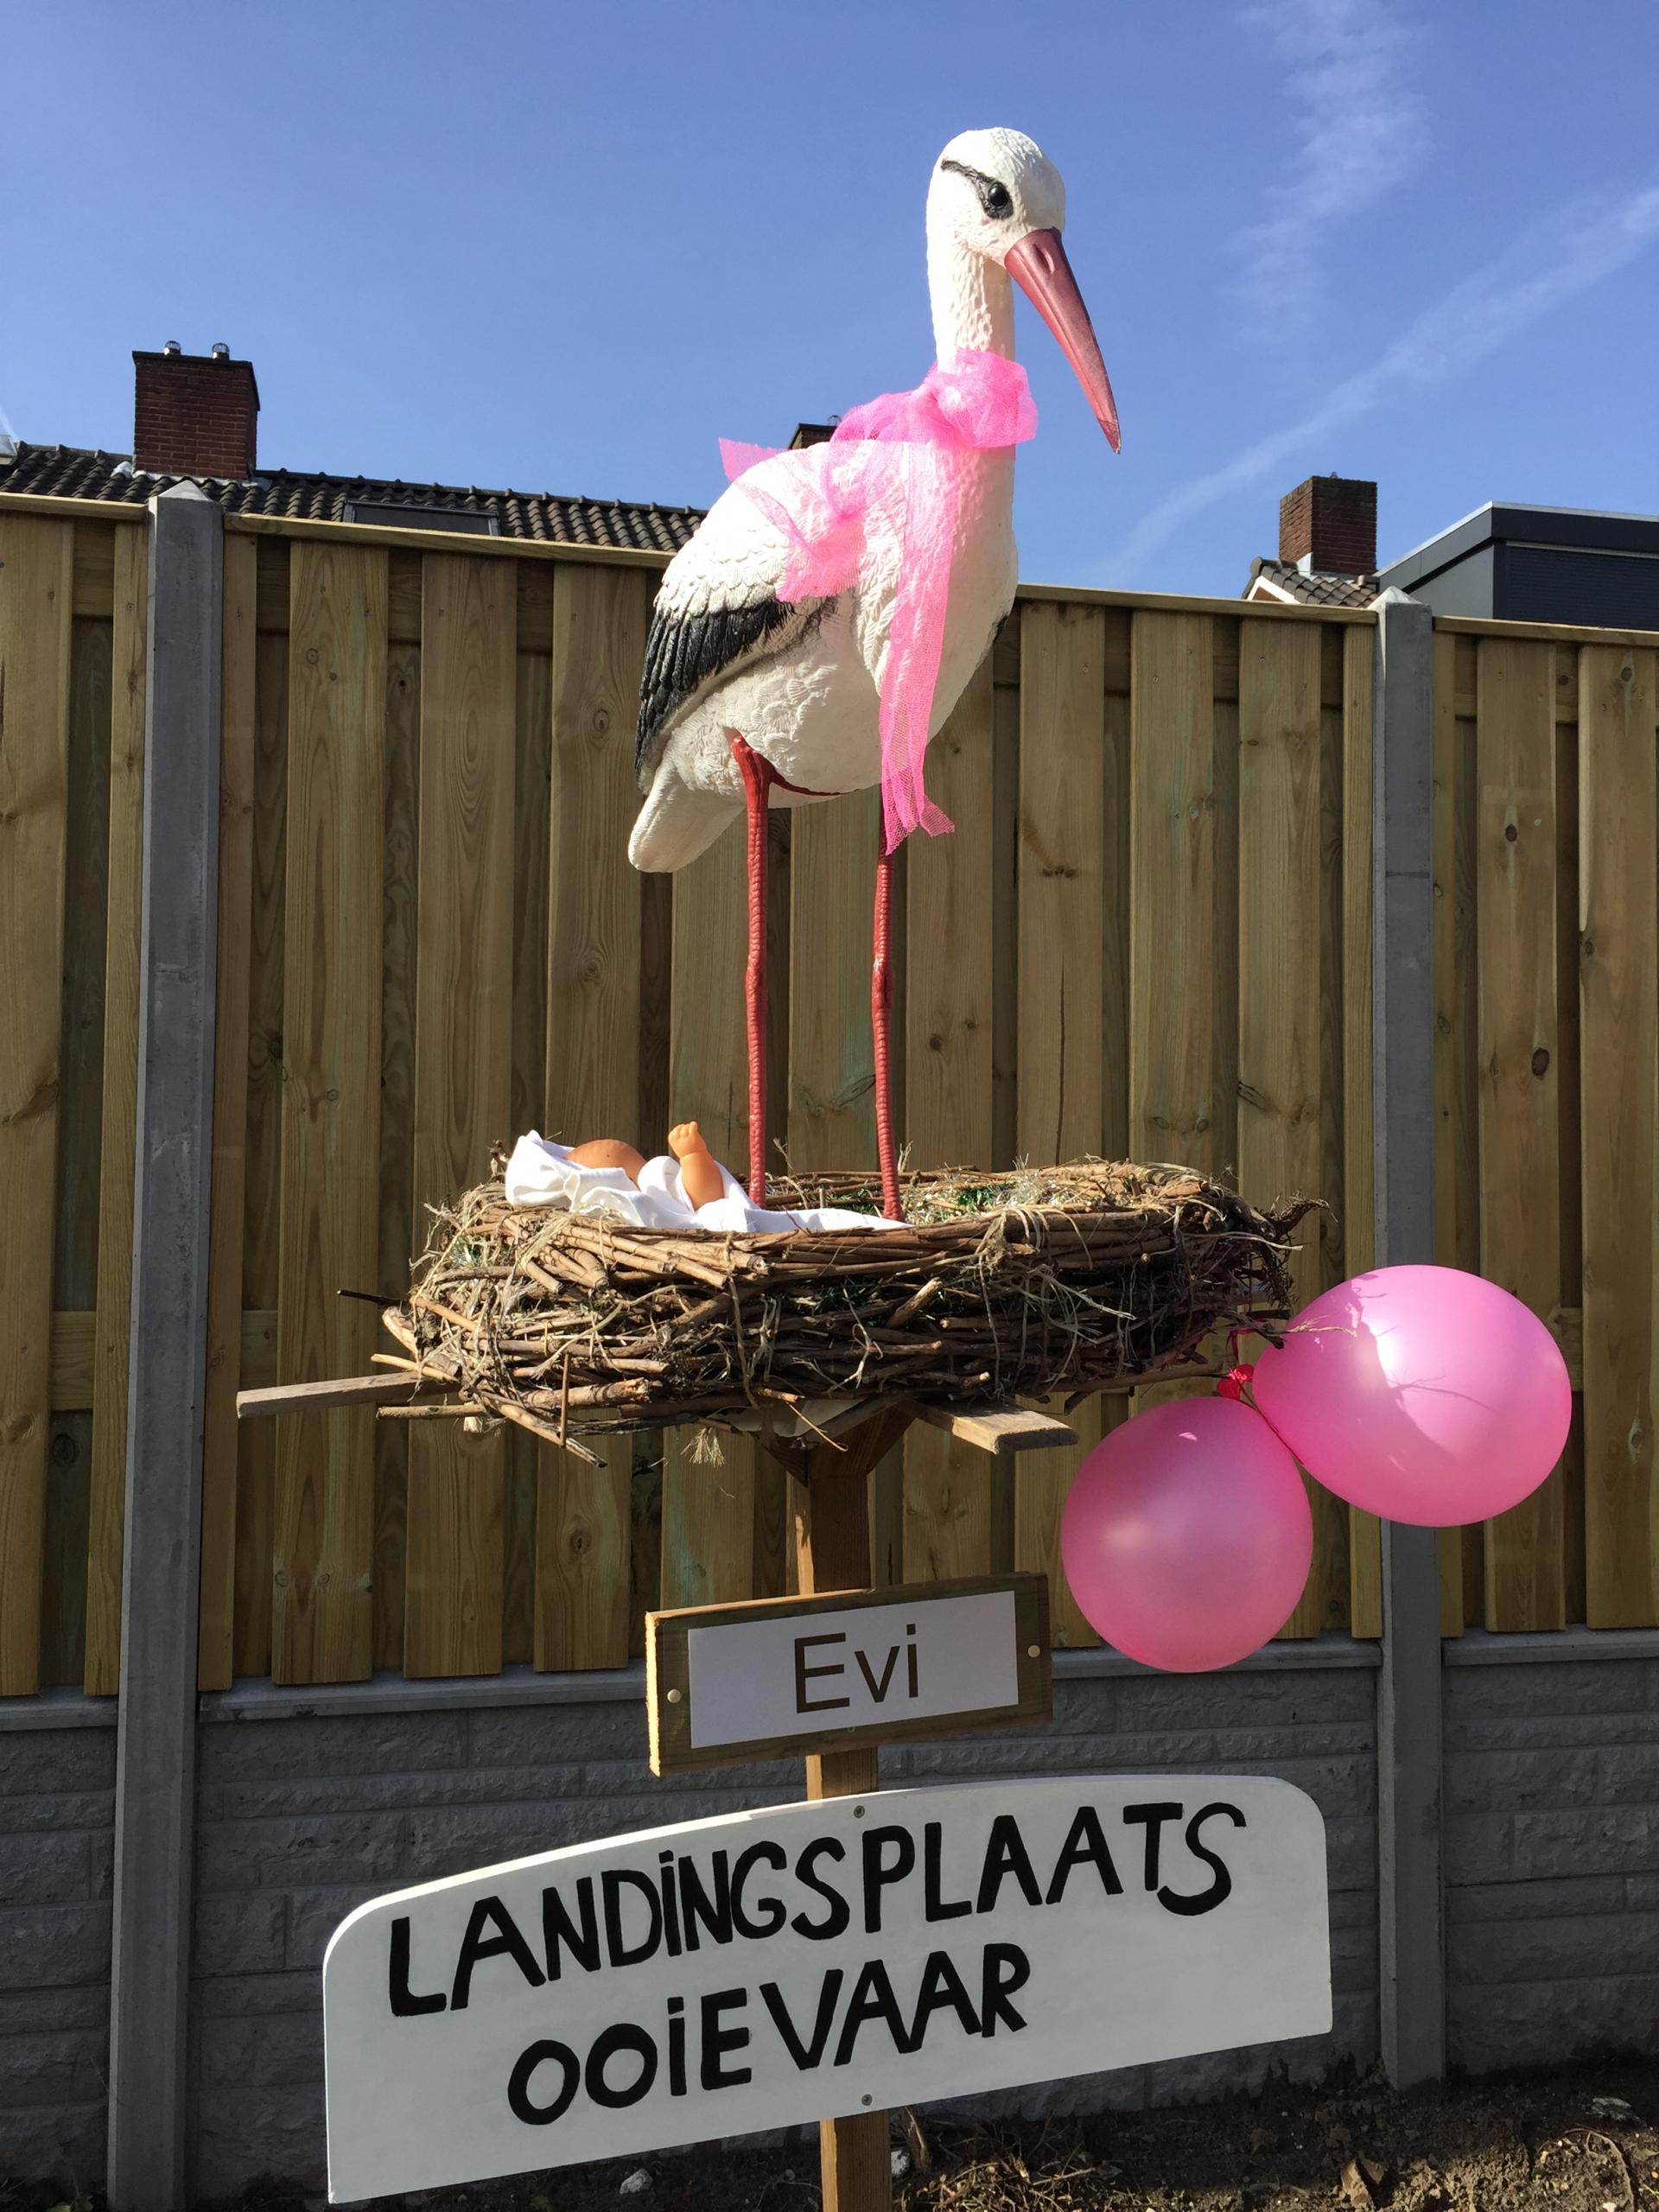 #19 0 R Ooievaar op nest, liggende baby, strikje om nek, 2 ballonnen